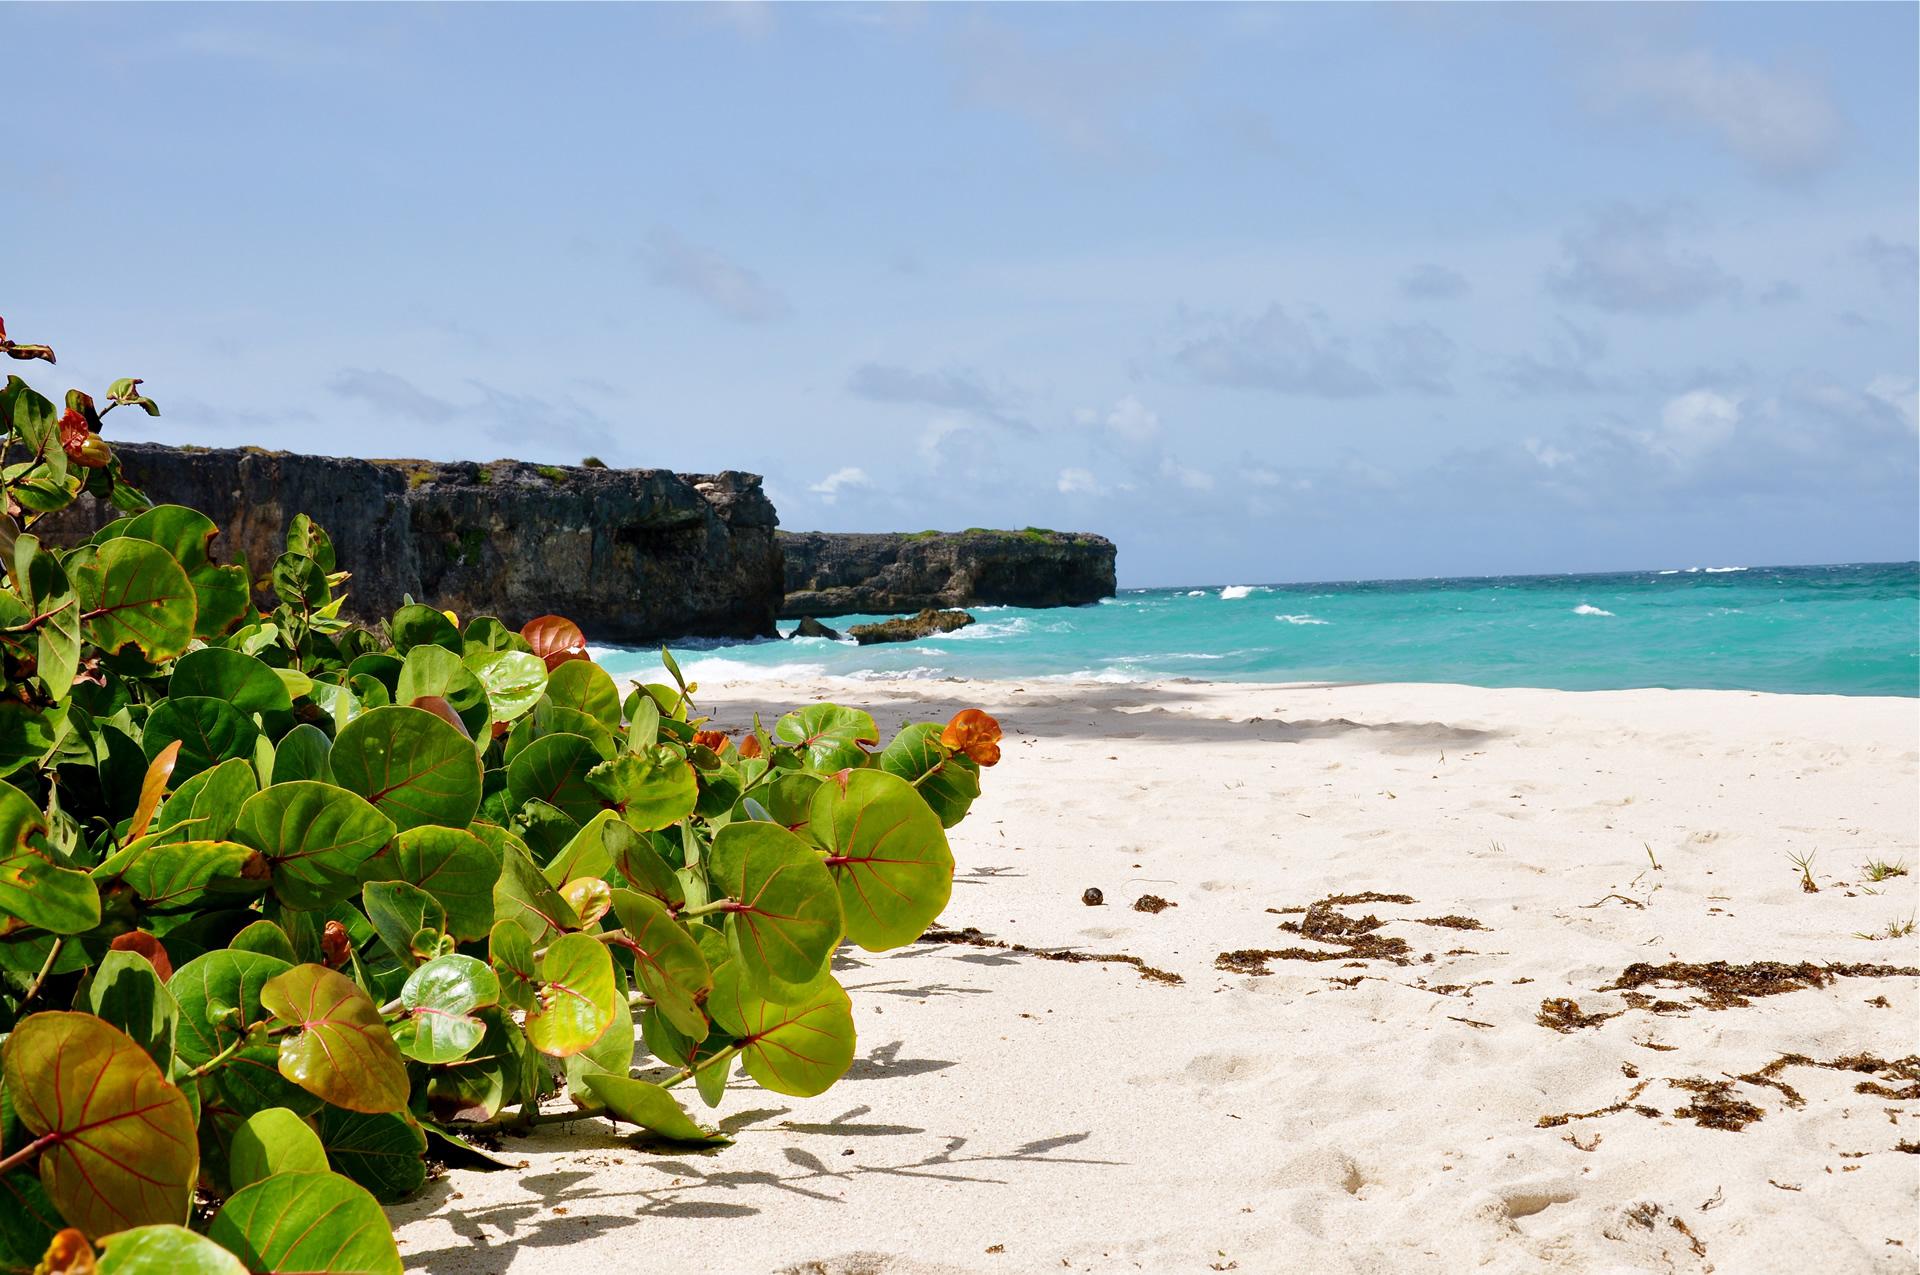 фото пляжей барбадоса возвращалась тетрадям течение